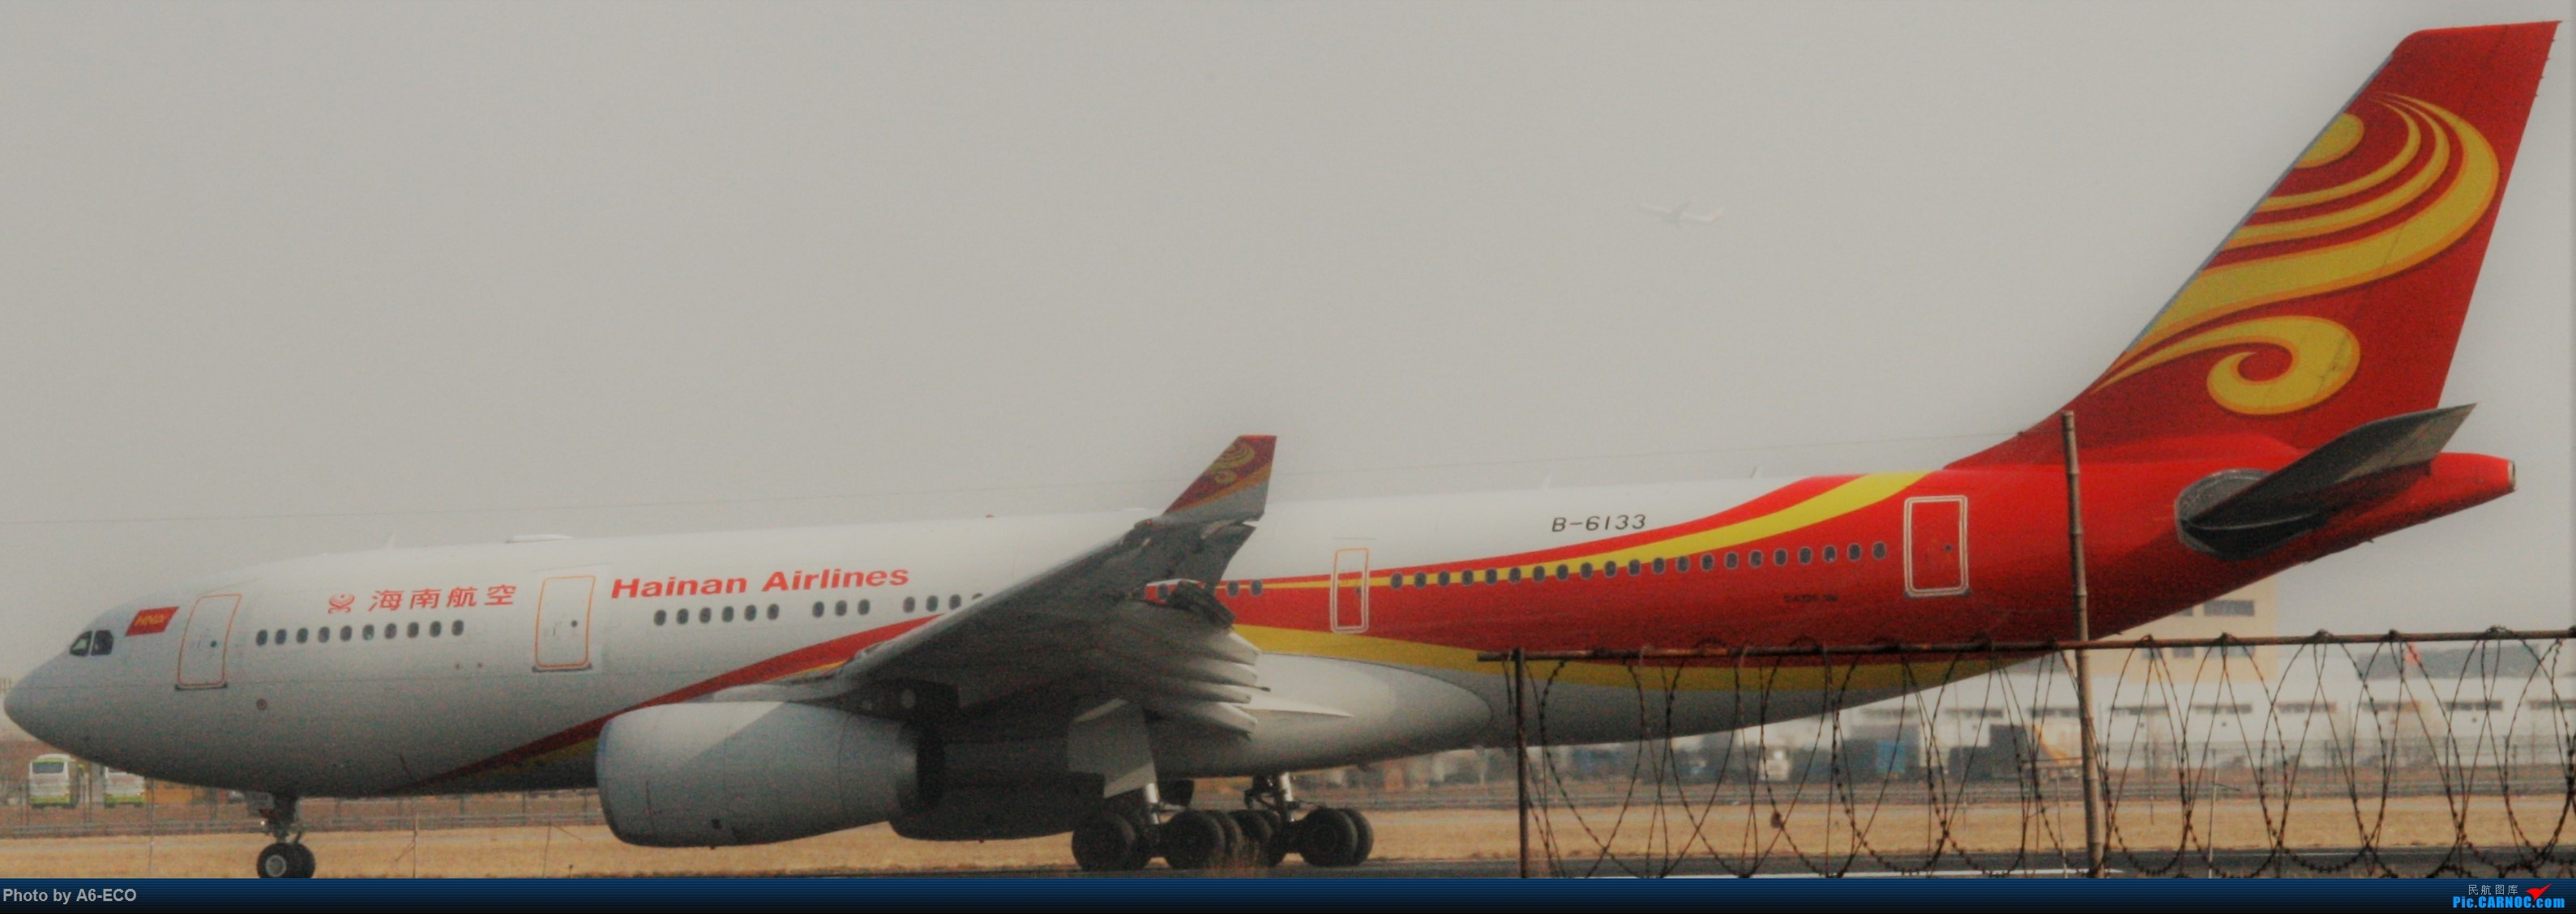 Re:[原创]今天运气极好,云南孔雀,B-1070,2个菜航邮戳,泡菜航彩绘,东航邮戳...... AIRBUS A330-200 B-6133 中国北京首都国际机场